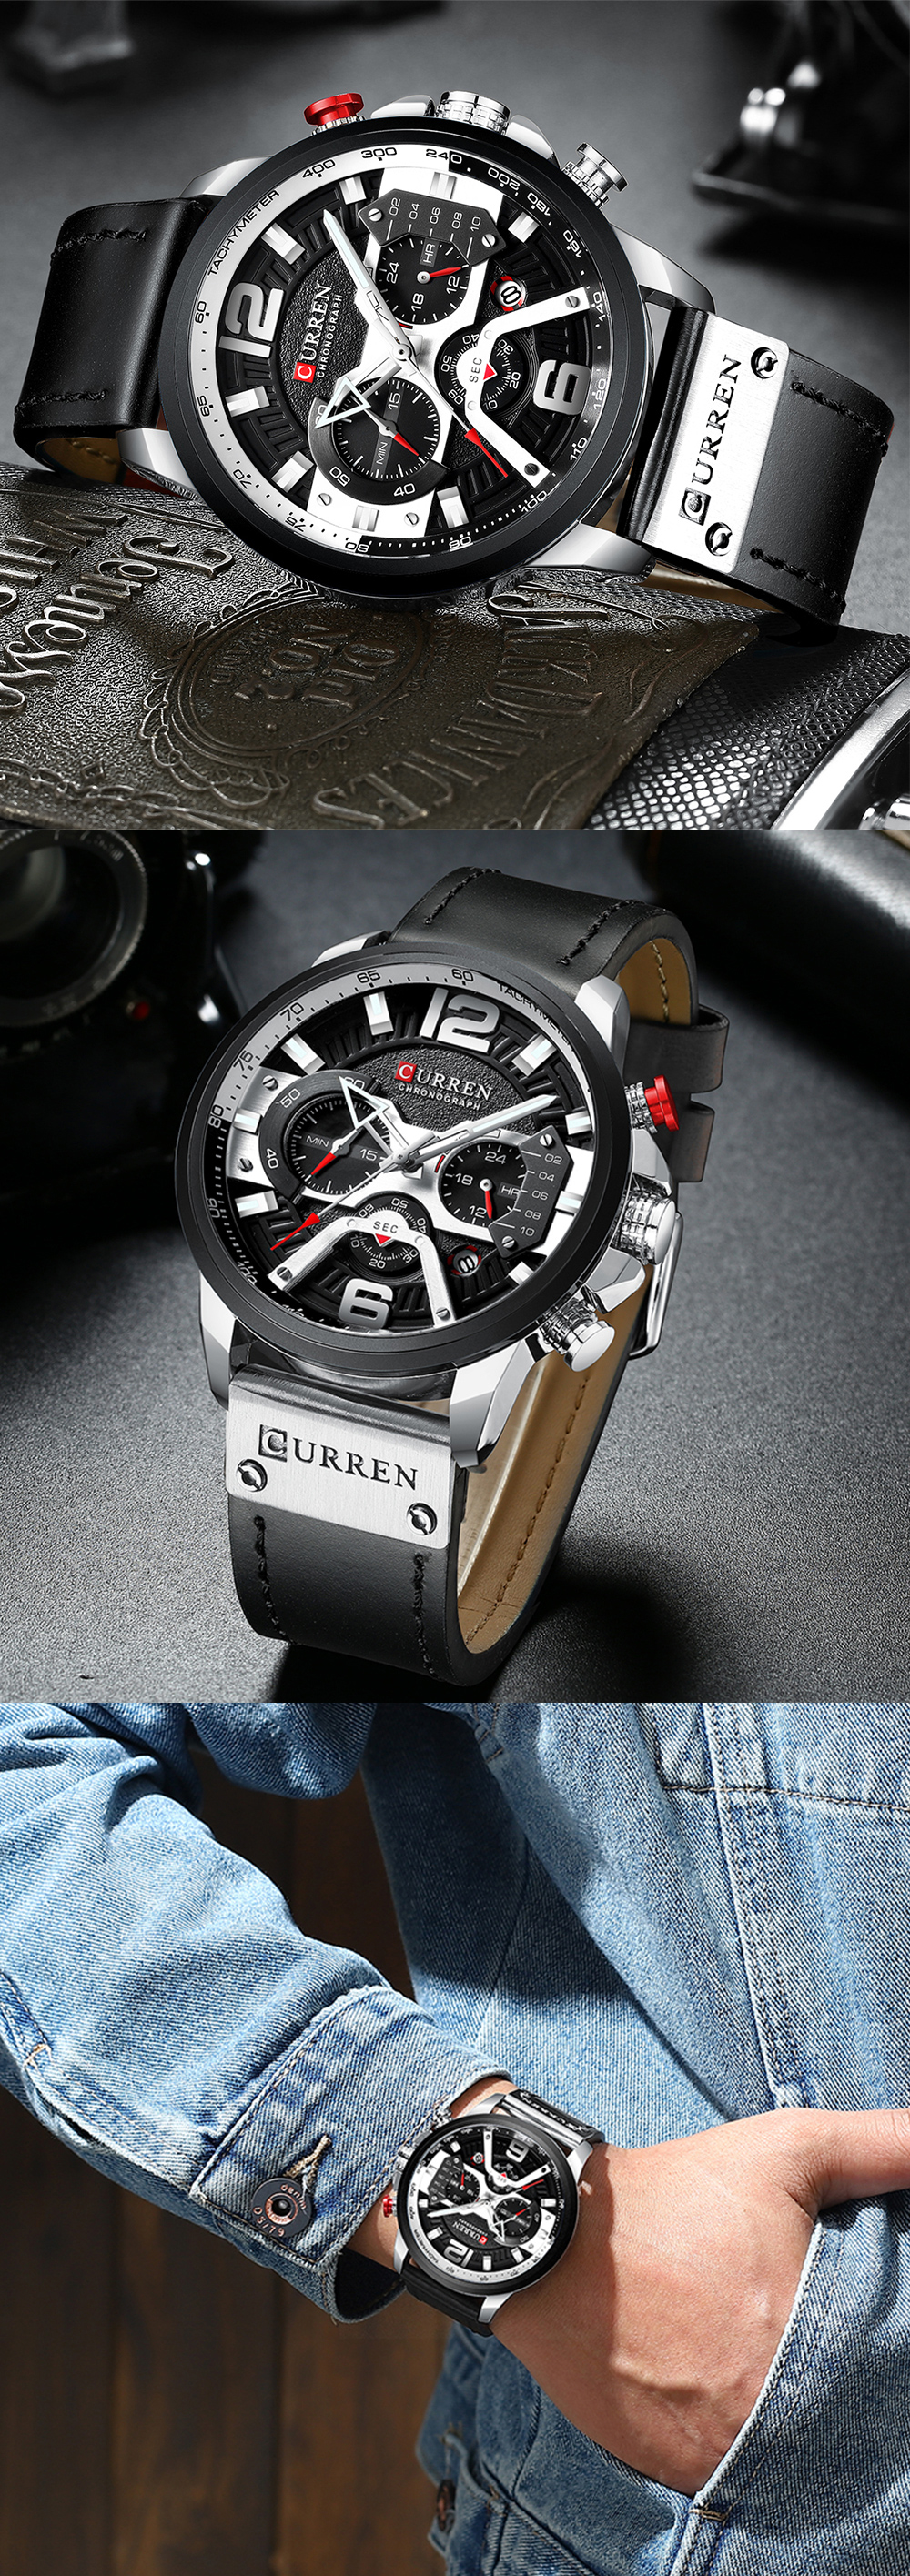 H7a15c8f5fabe45b5a5d0c515fdf58b72A CURREN Watch Men Business Watches Orologio Uomo Leather band Wristwatch Leather Quartz Watch Zegarek Meski Reloj Hombre man gift